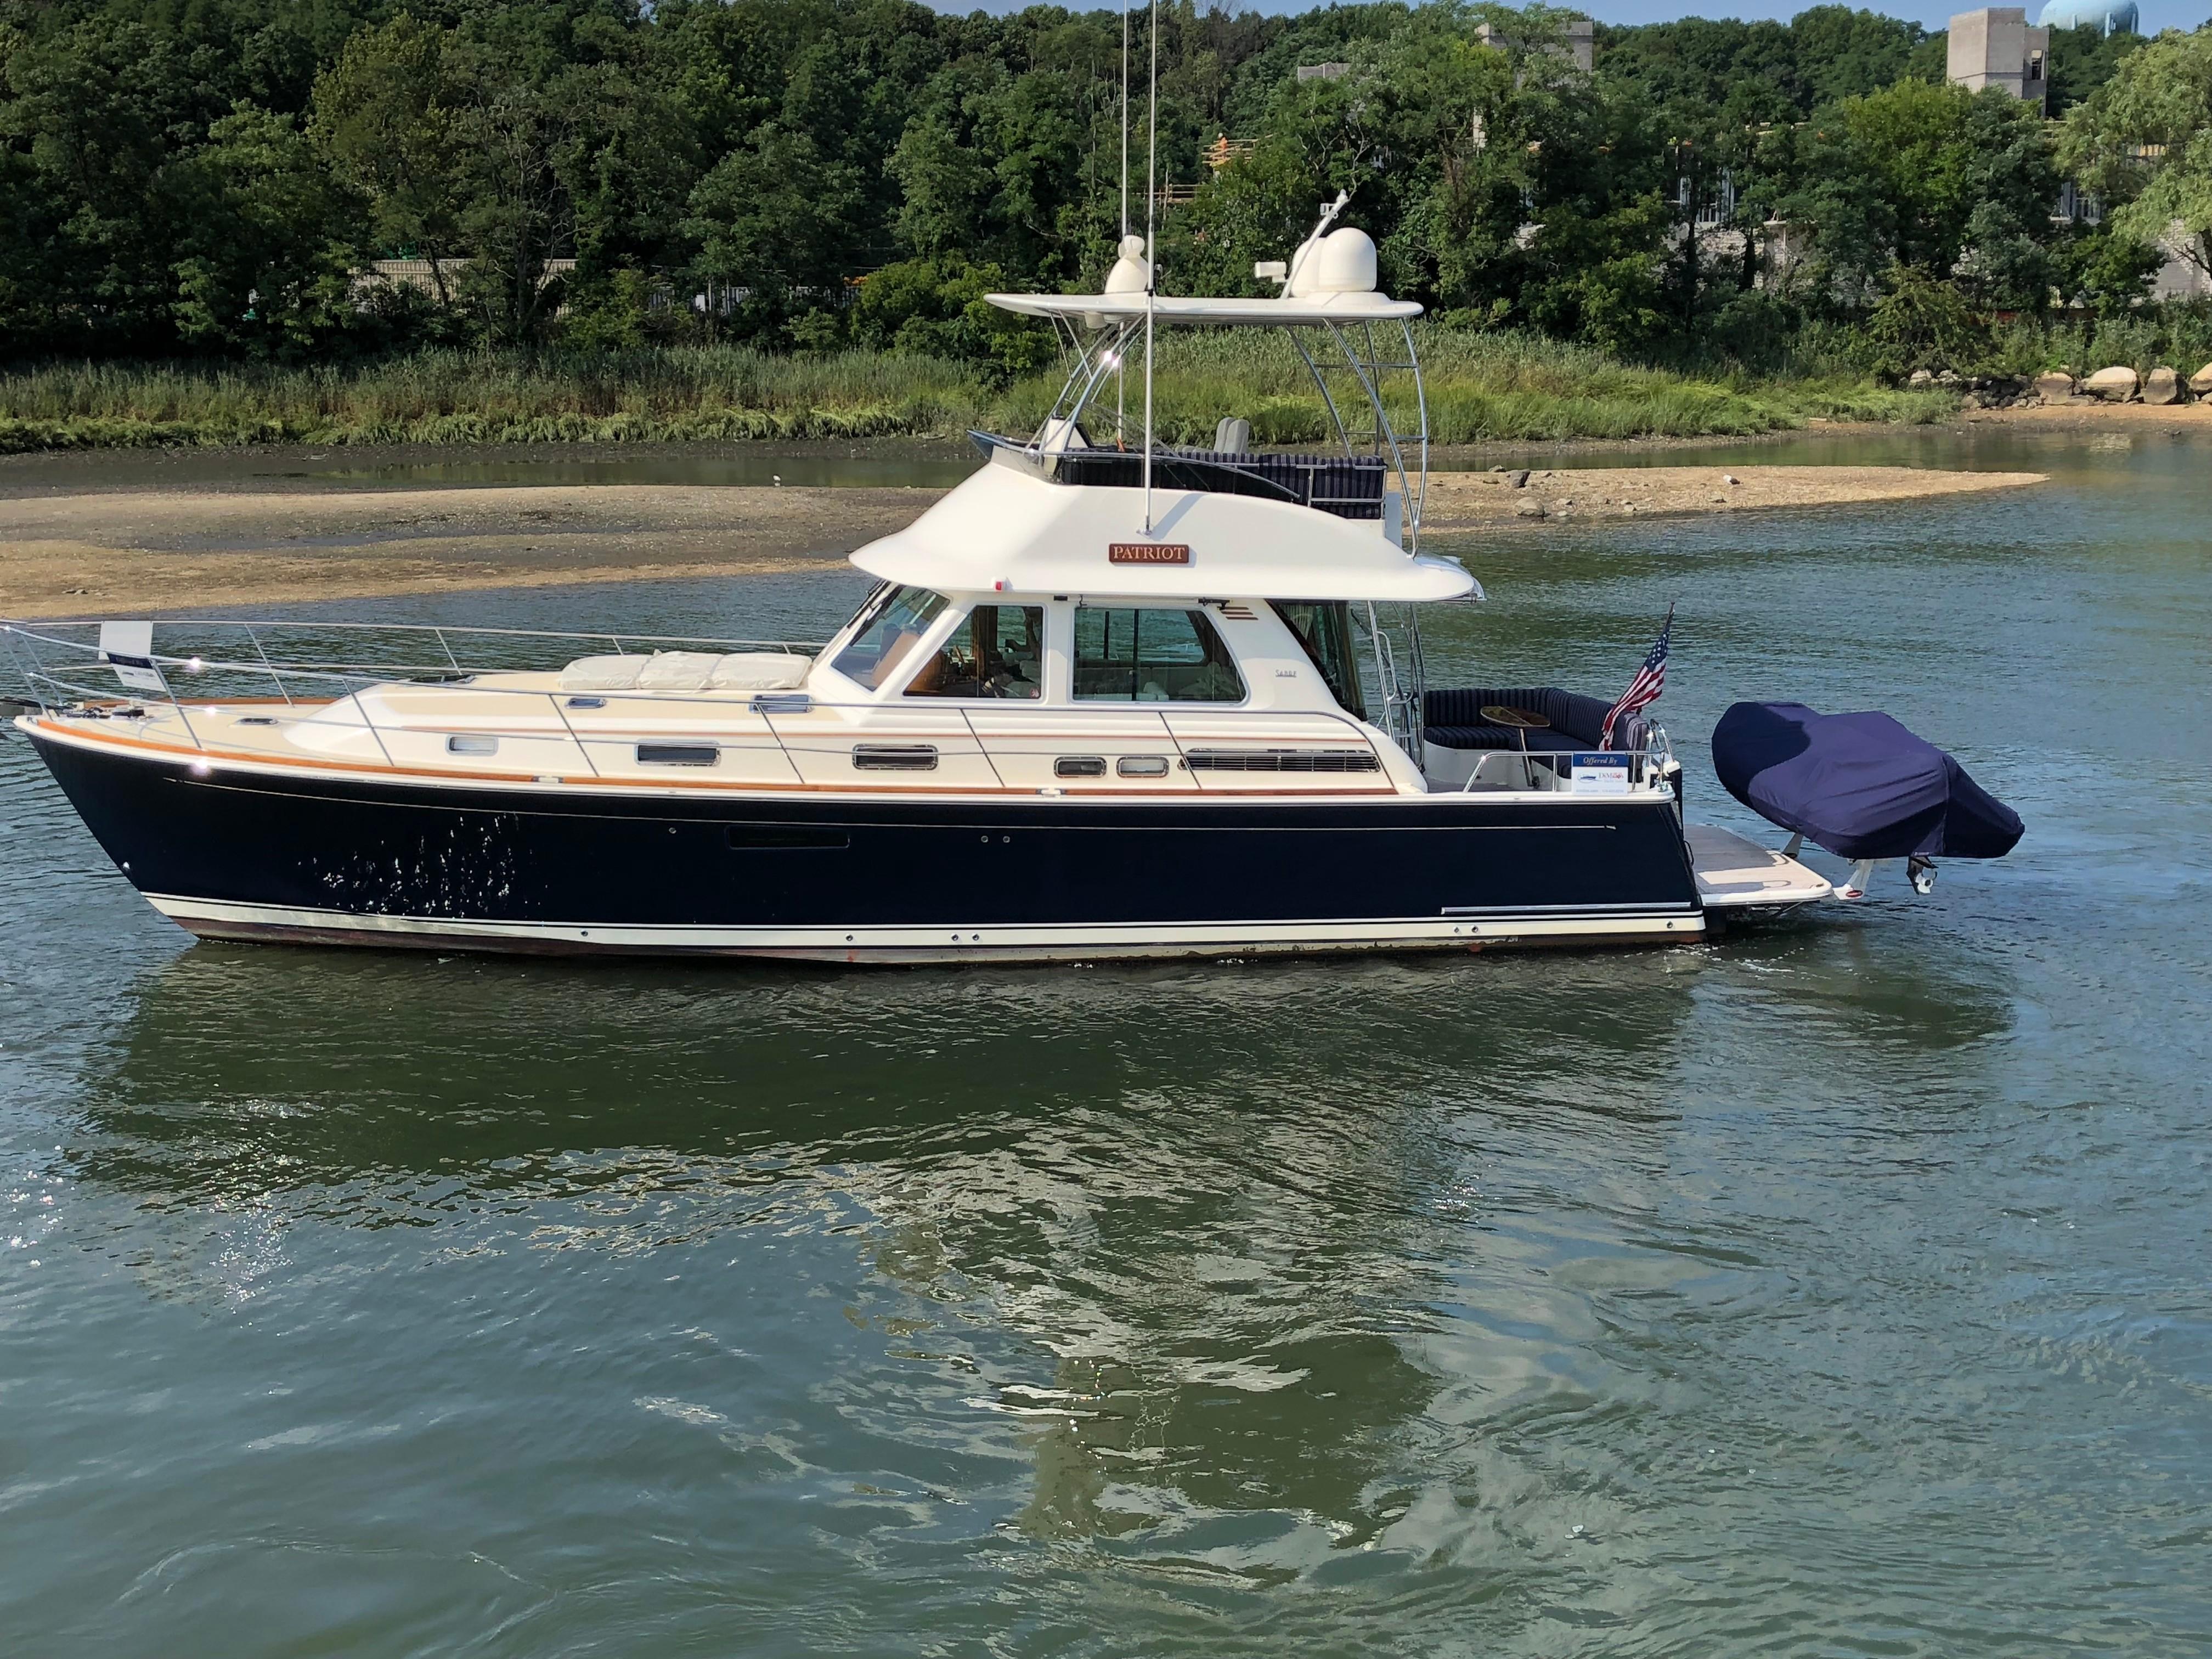 2018 Sabre 48 Flybridge Power Boat For Sale - www.yachtworld.com